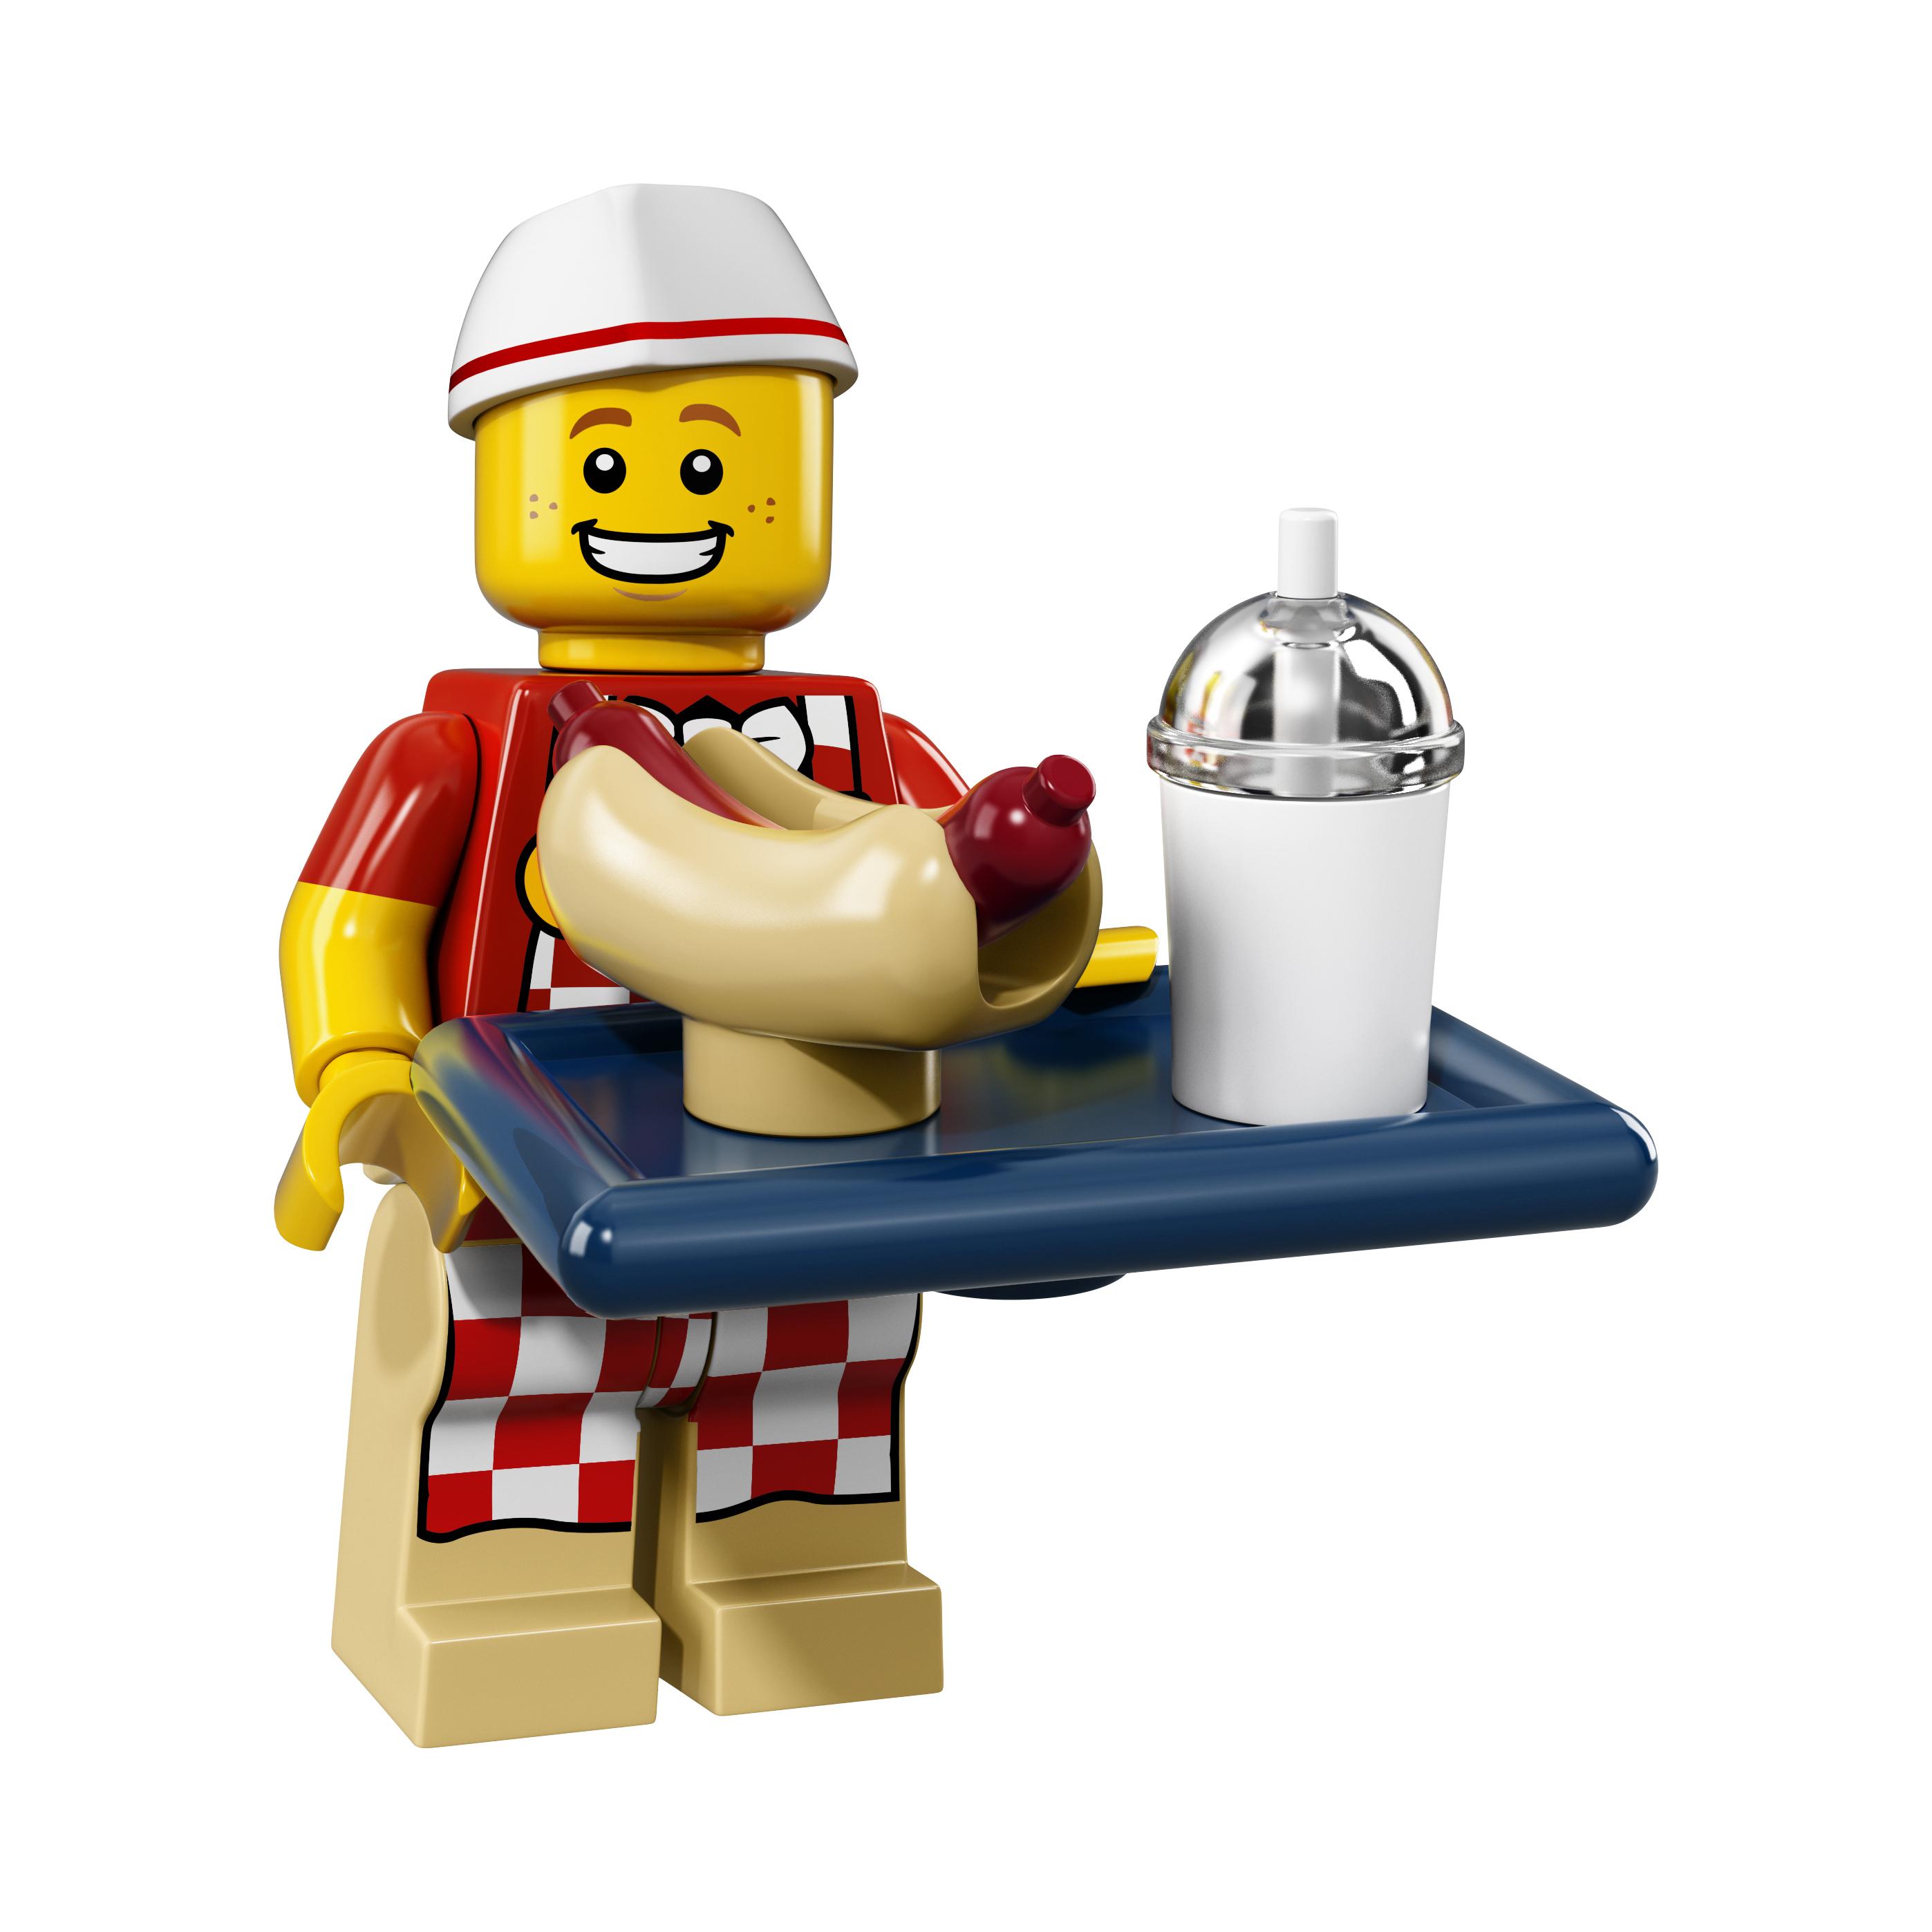 LEGO minifgs series 17 Hot Dog Vendor